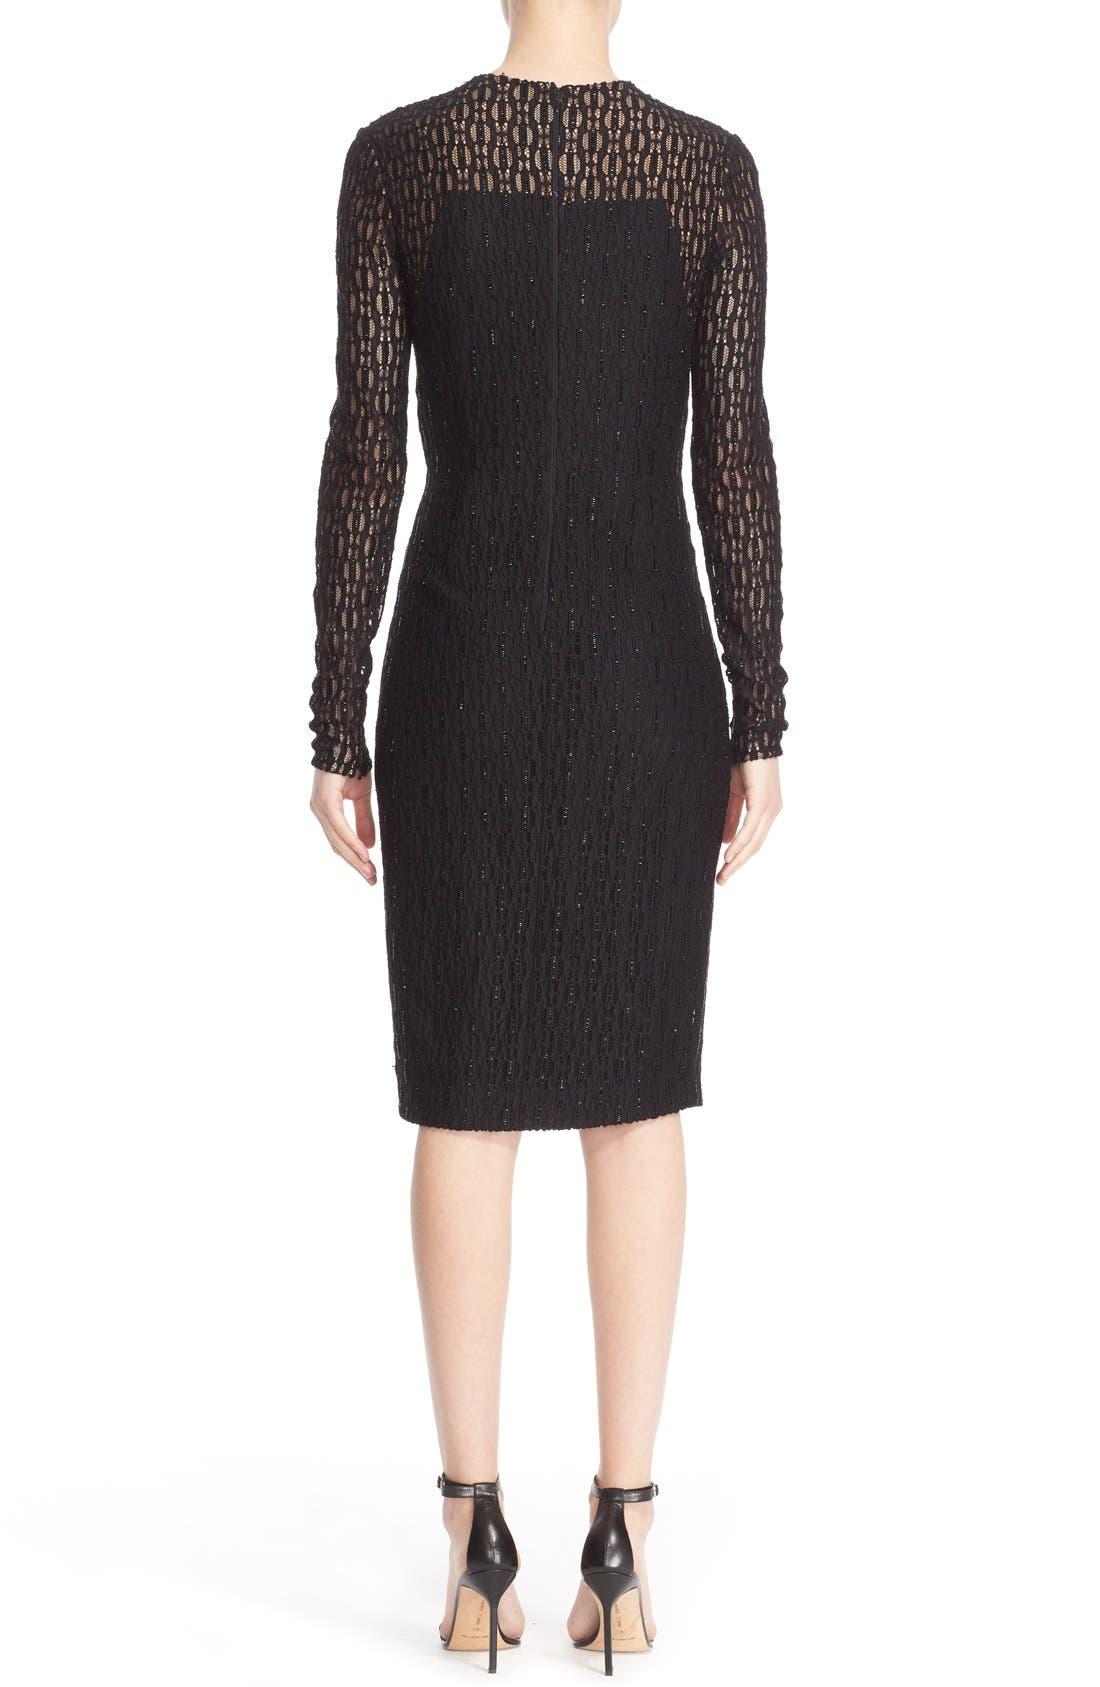 Embellished Illusion Lace Knit Sheath Dress,                             Alternate thumbnail 4, color,                             001